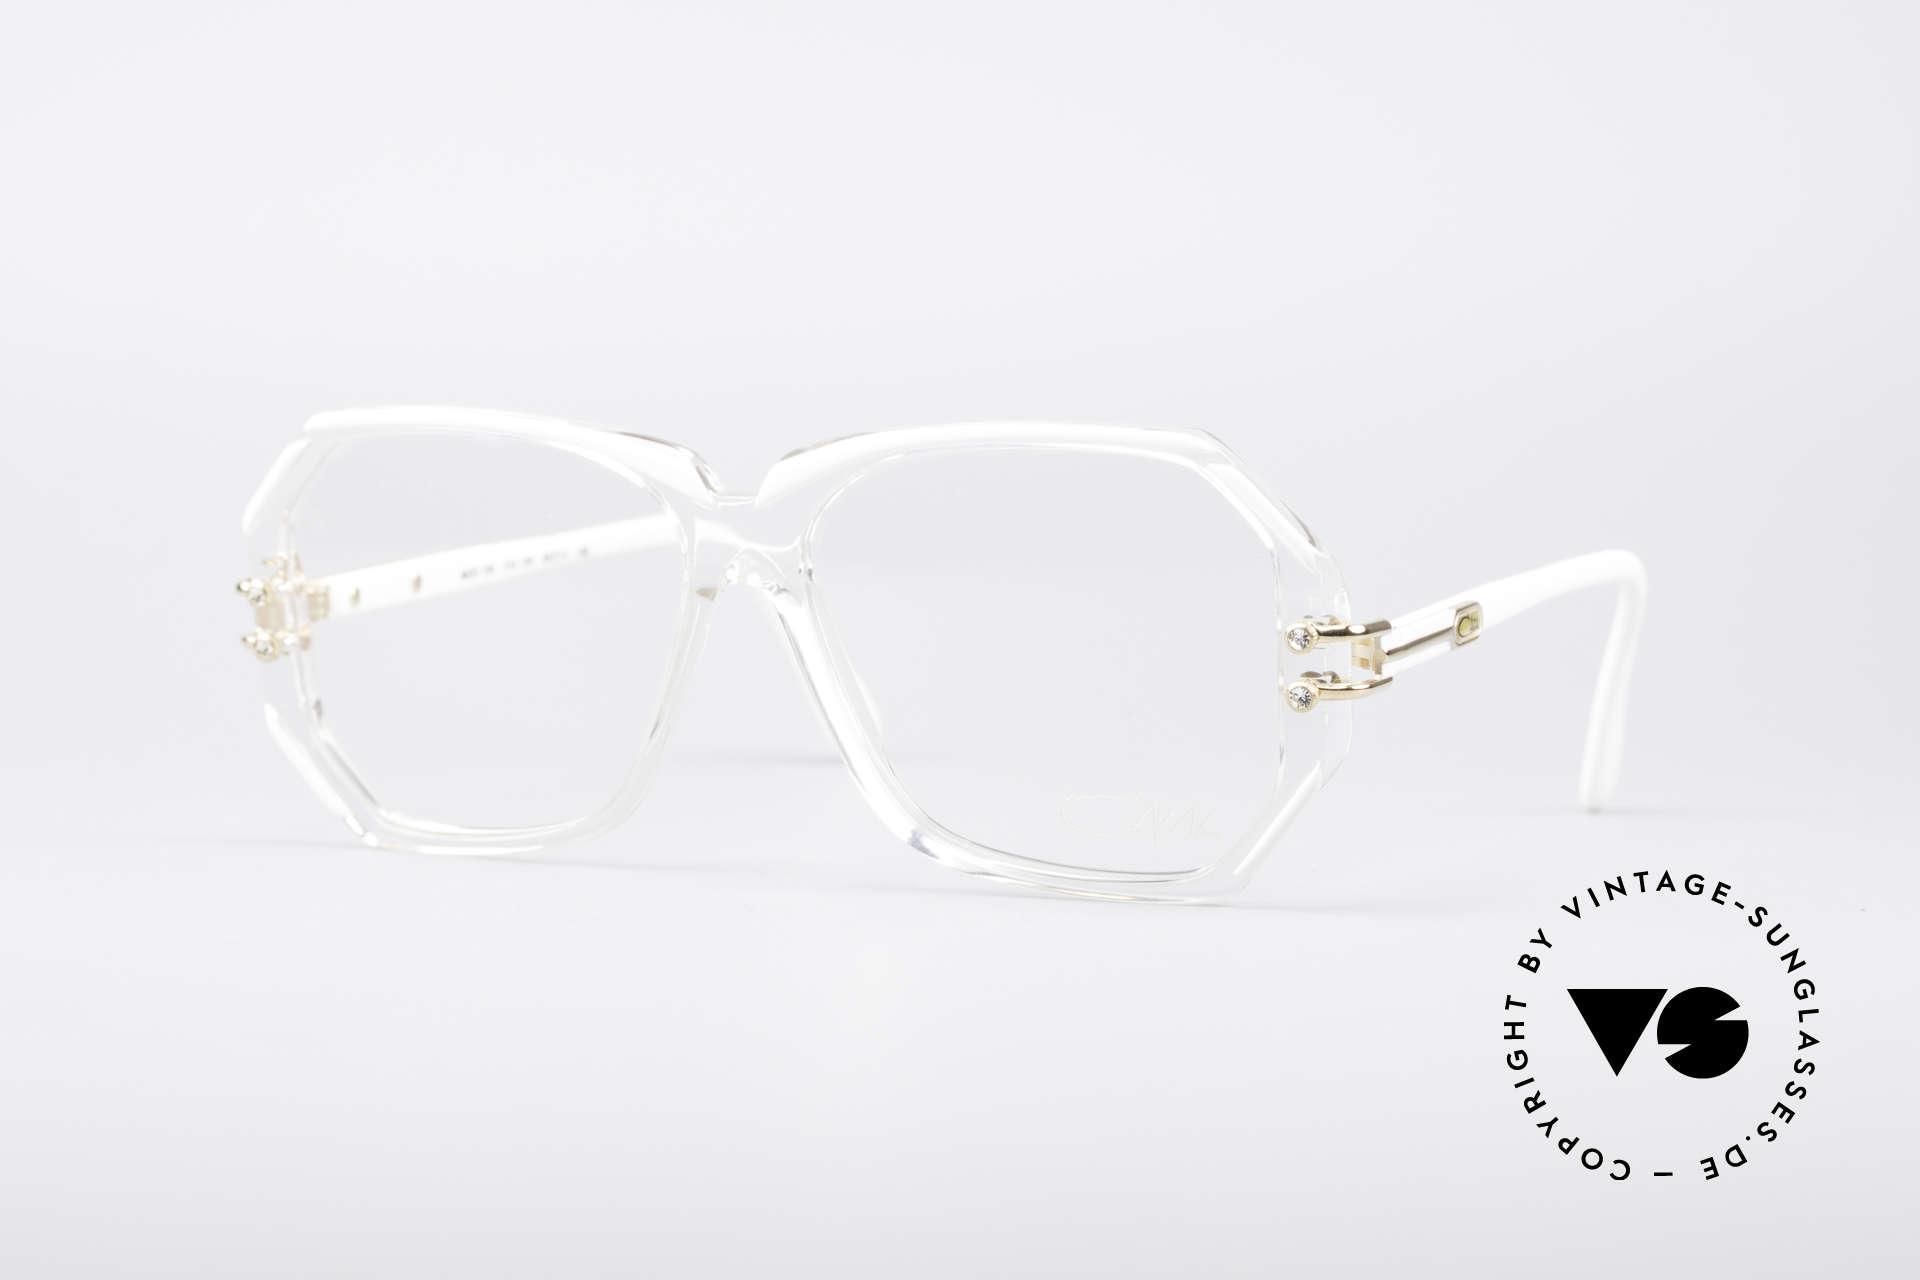 Cazal 169 Small Designer Frame, extravagant vintage Cazal designer eyeglass-frame, Made for Women